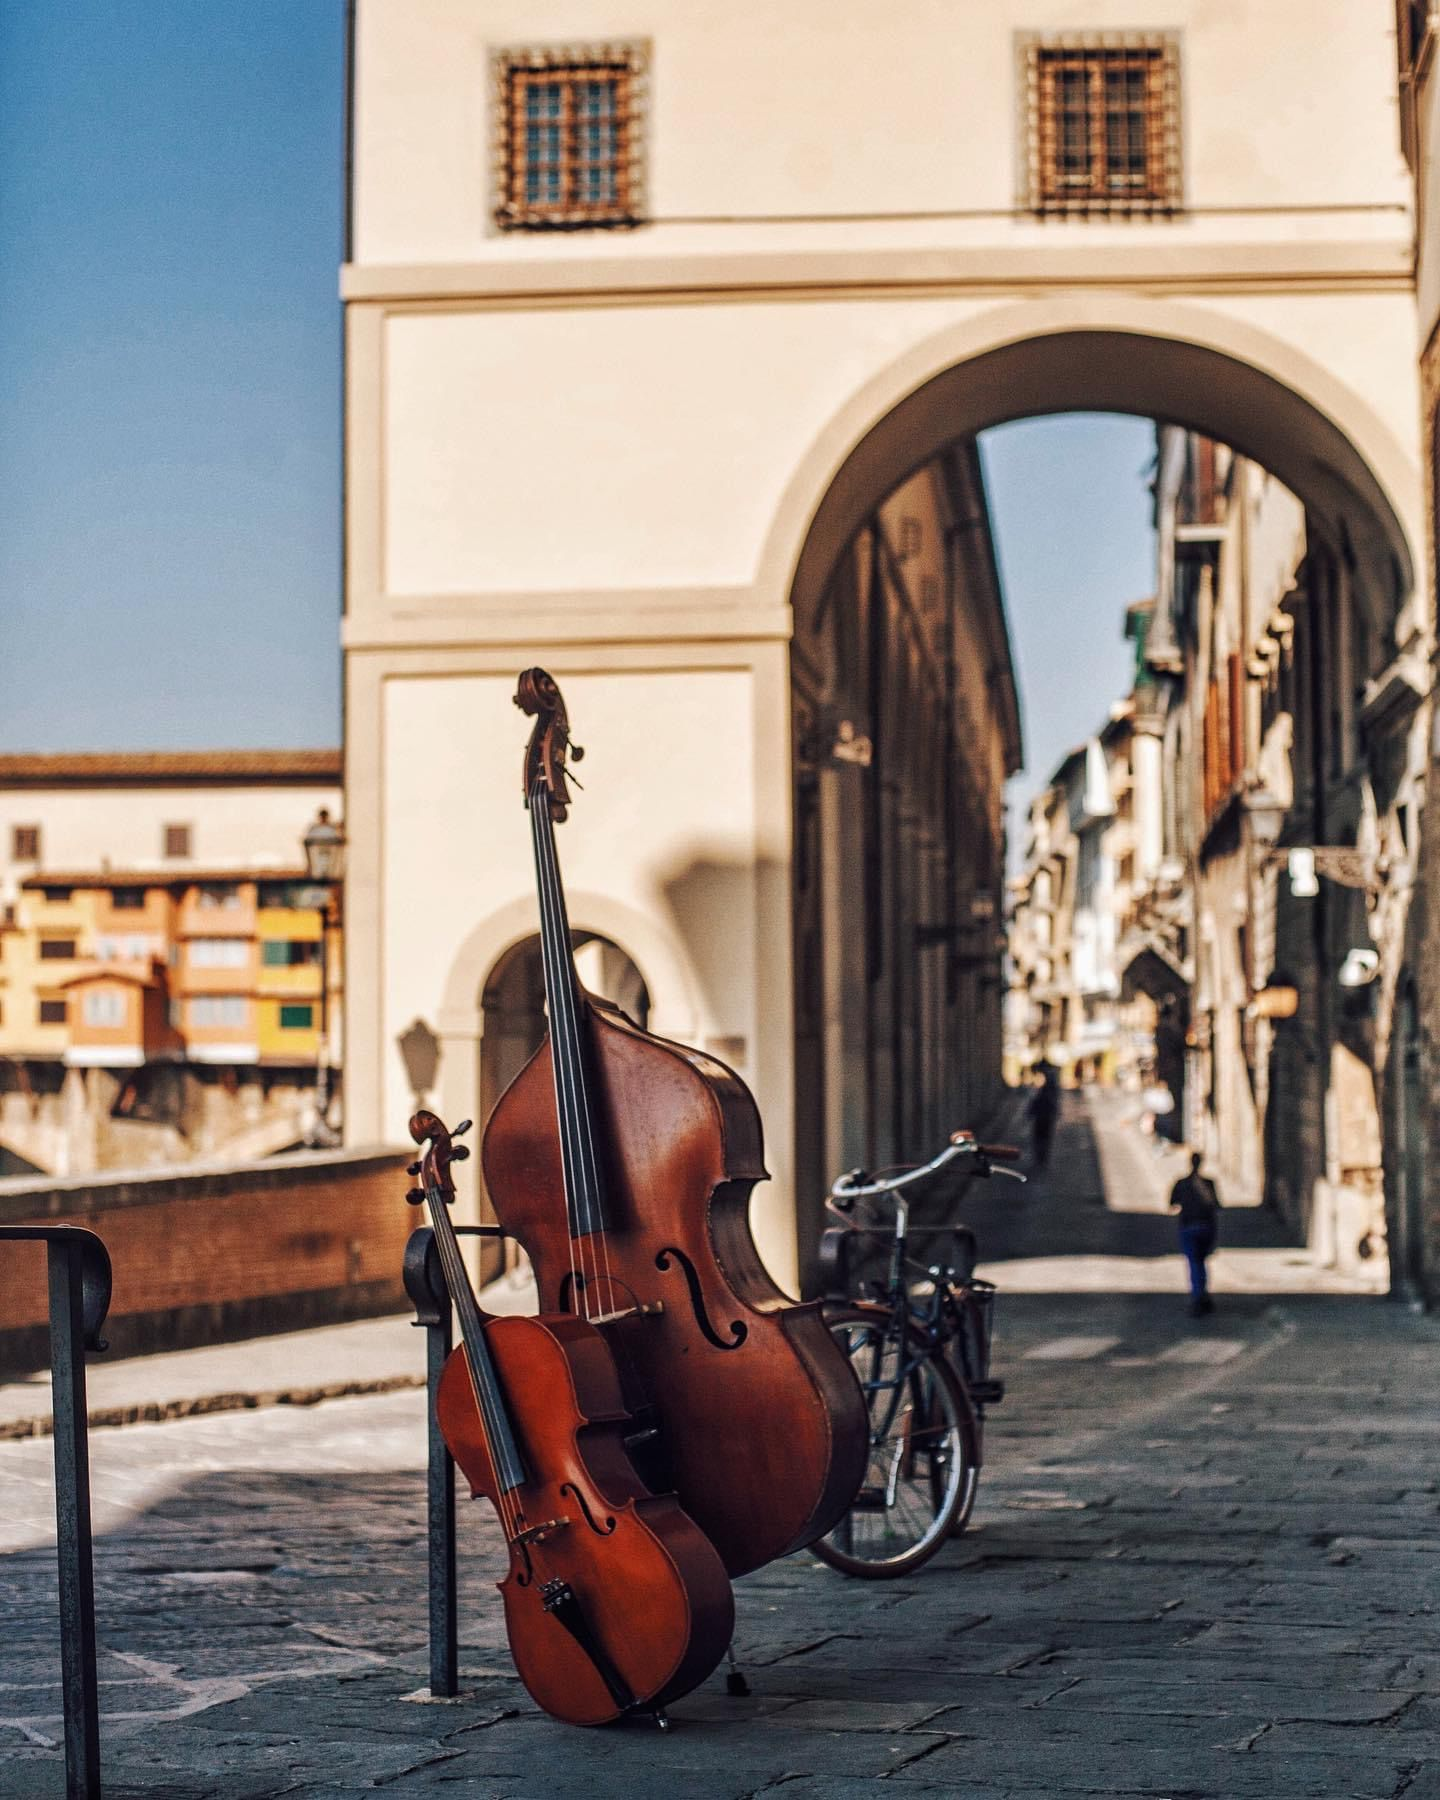 InNova Forma Festival a Firenze